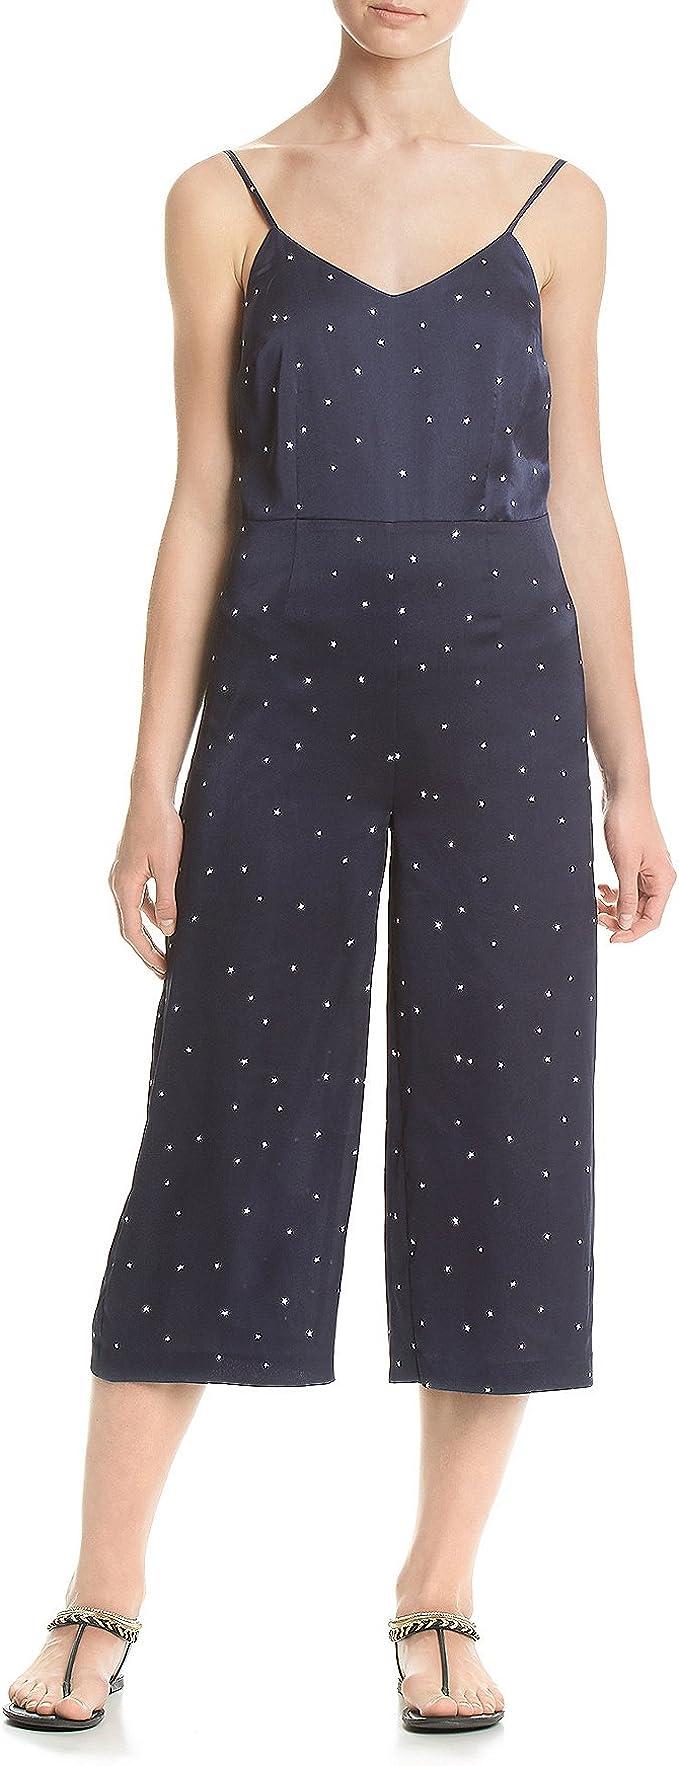 CRYYU Women Deep V-Neck Bodycon Short Sleeve Jumpsuit Romper Denim Jeans Pants